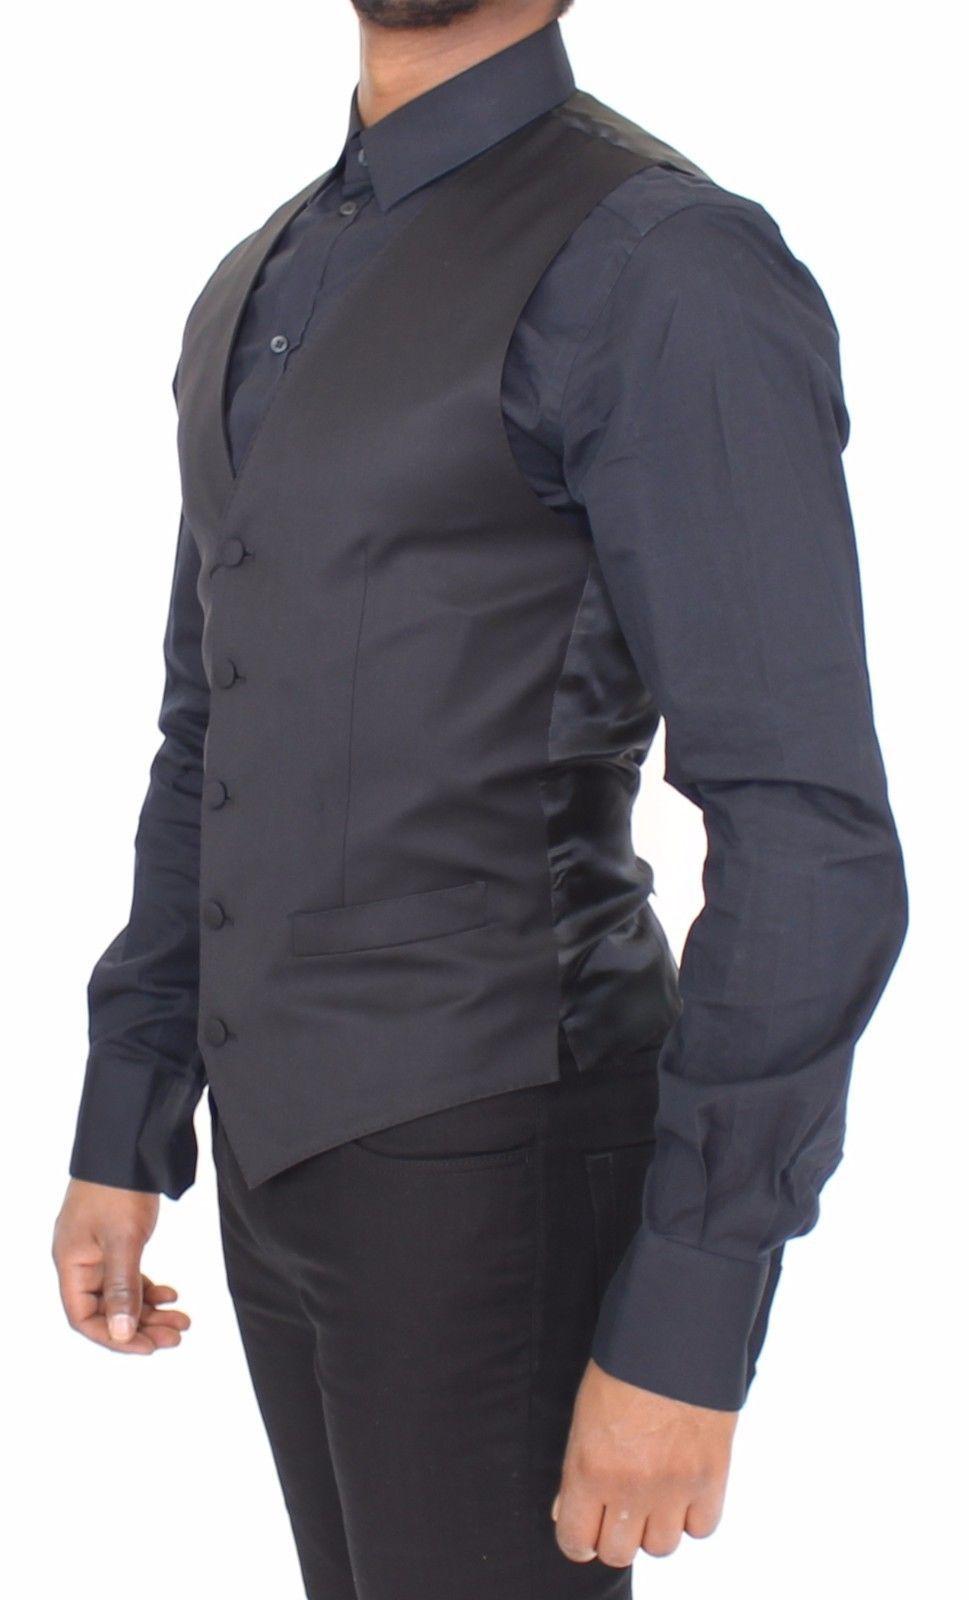 Dolce & Gabbana Black Wool Stretch Formal Dress Vest Gilet